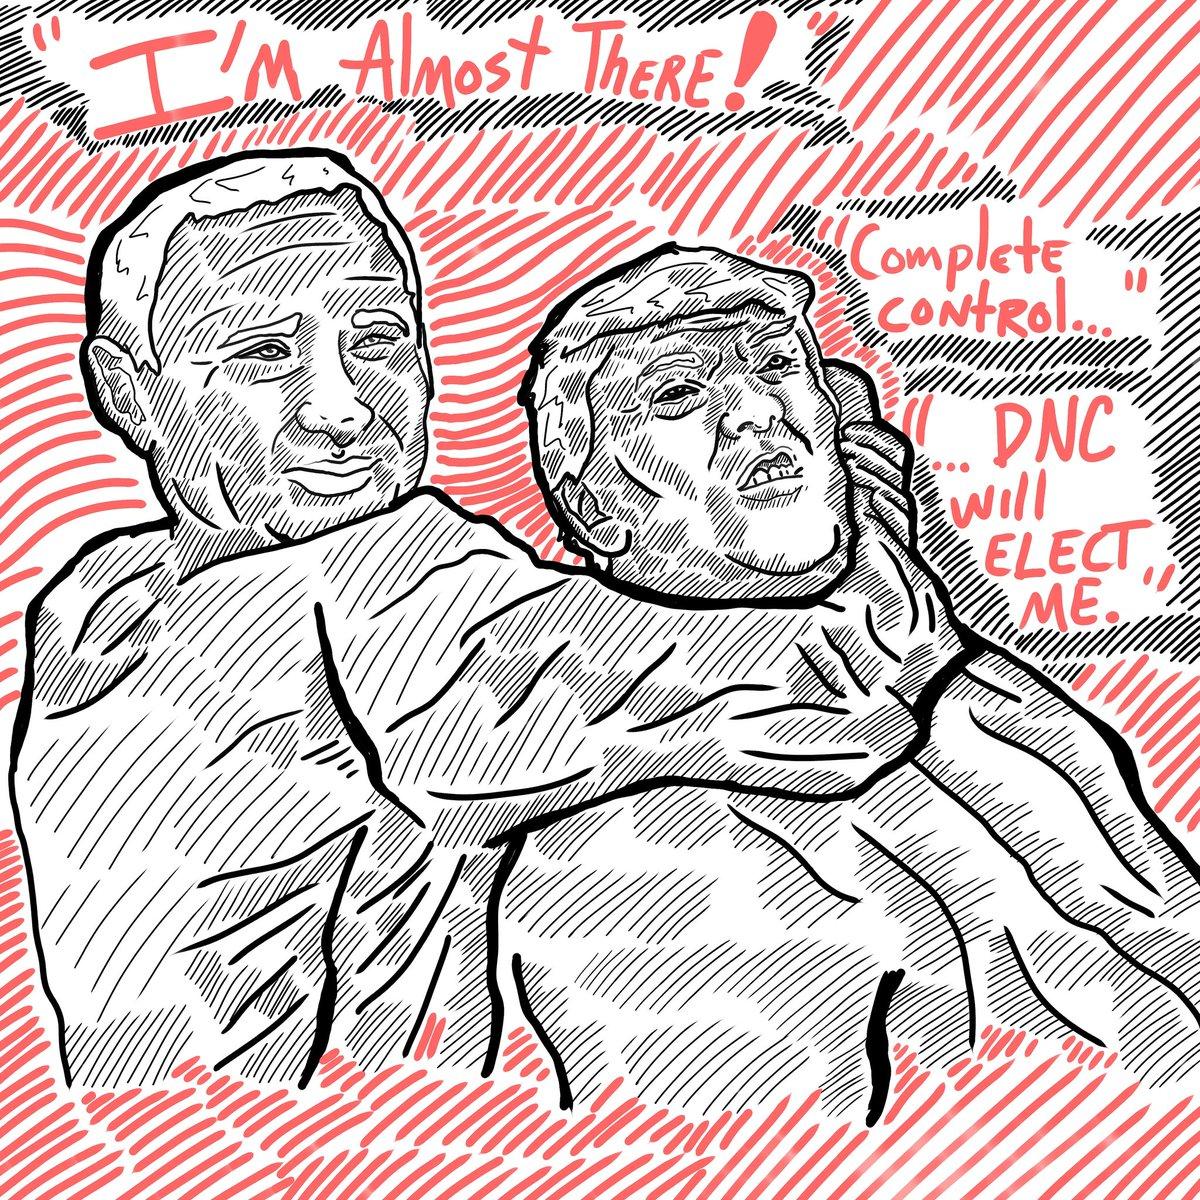 new lexicon comics #81 artist: solo monk - - - - #art #artist #solomonk #comics #sketch #Huntsville #huntsvilleal #huntsvillealabama #Alabama #Huntsvilleartist #newlexicon  #drawing #trump #notmeus #president #dnc #primaries  #politics #control #fear  #election  #huntsvilleartpic.twitter.com/PB8qD9mm9n